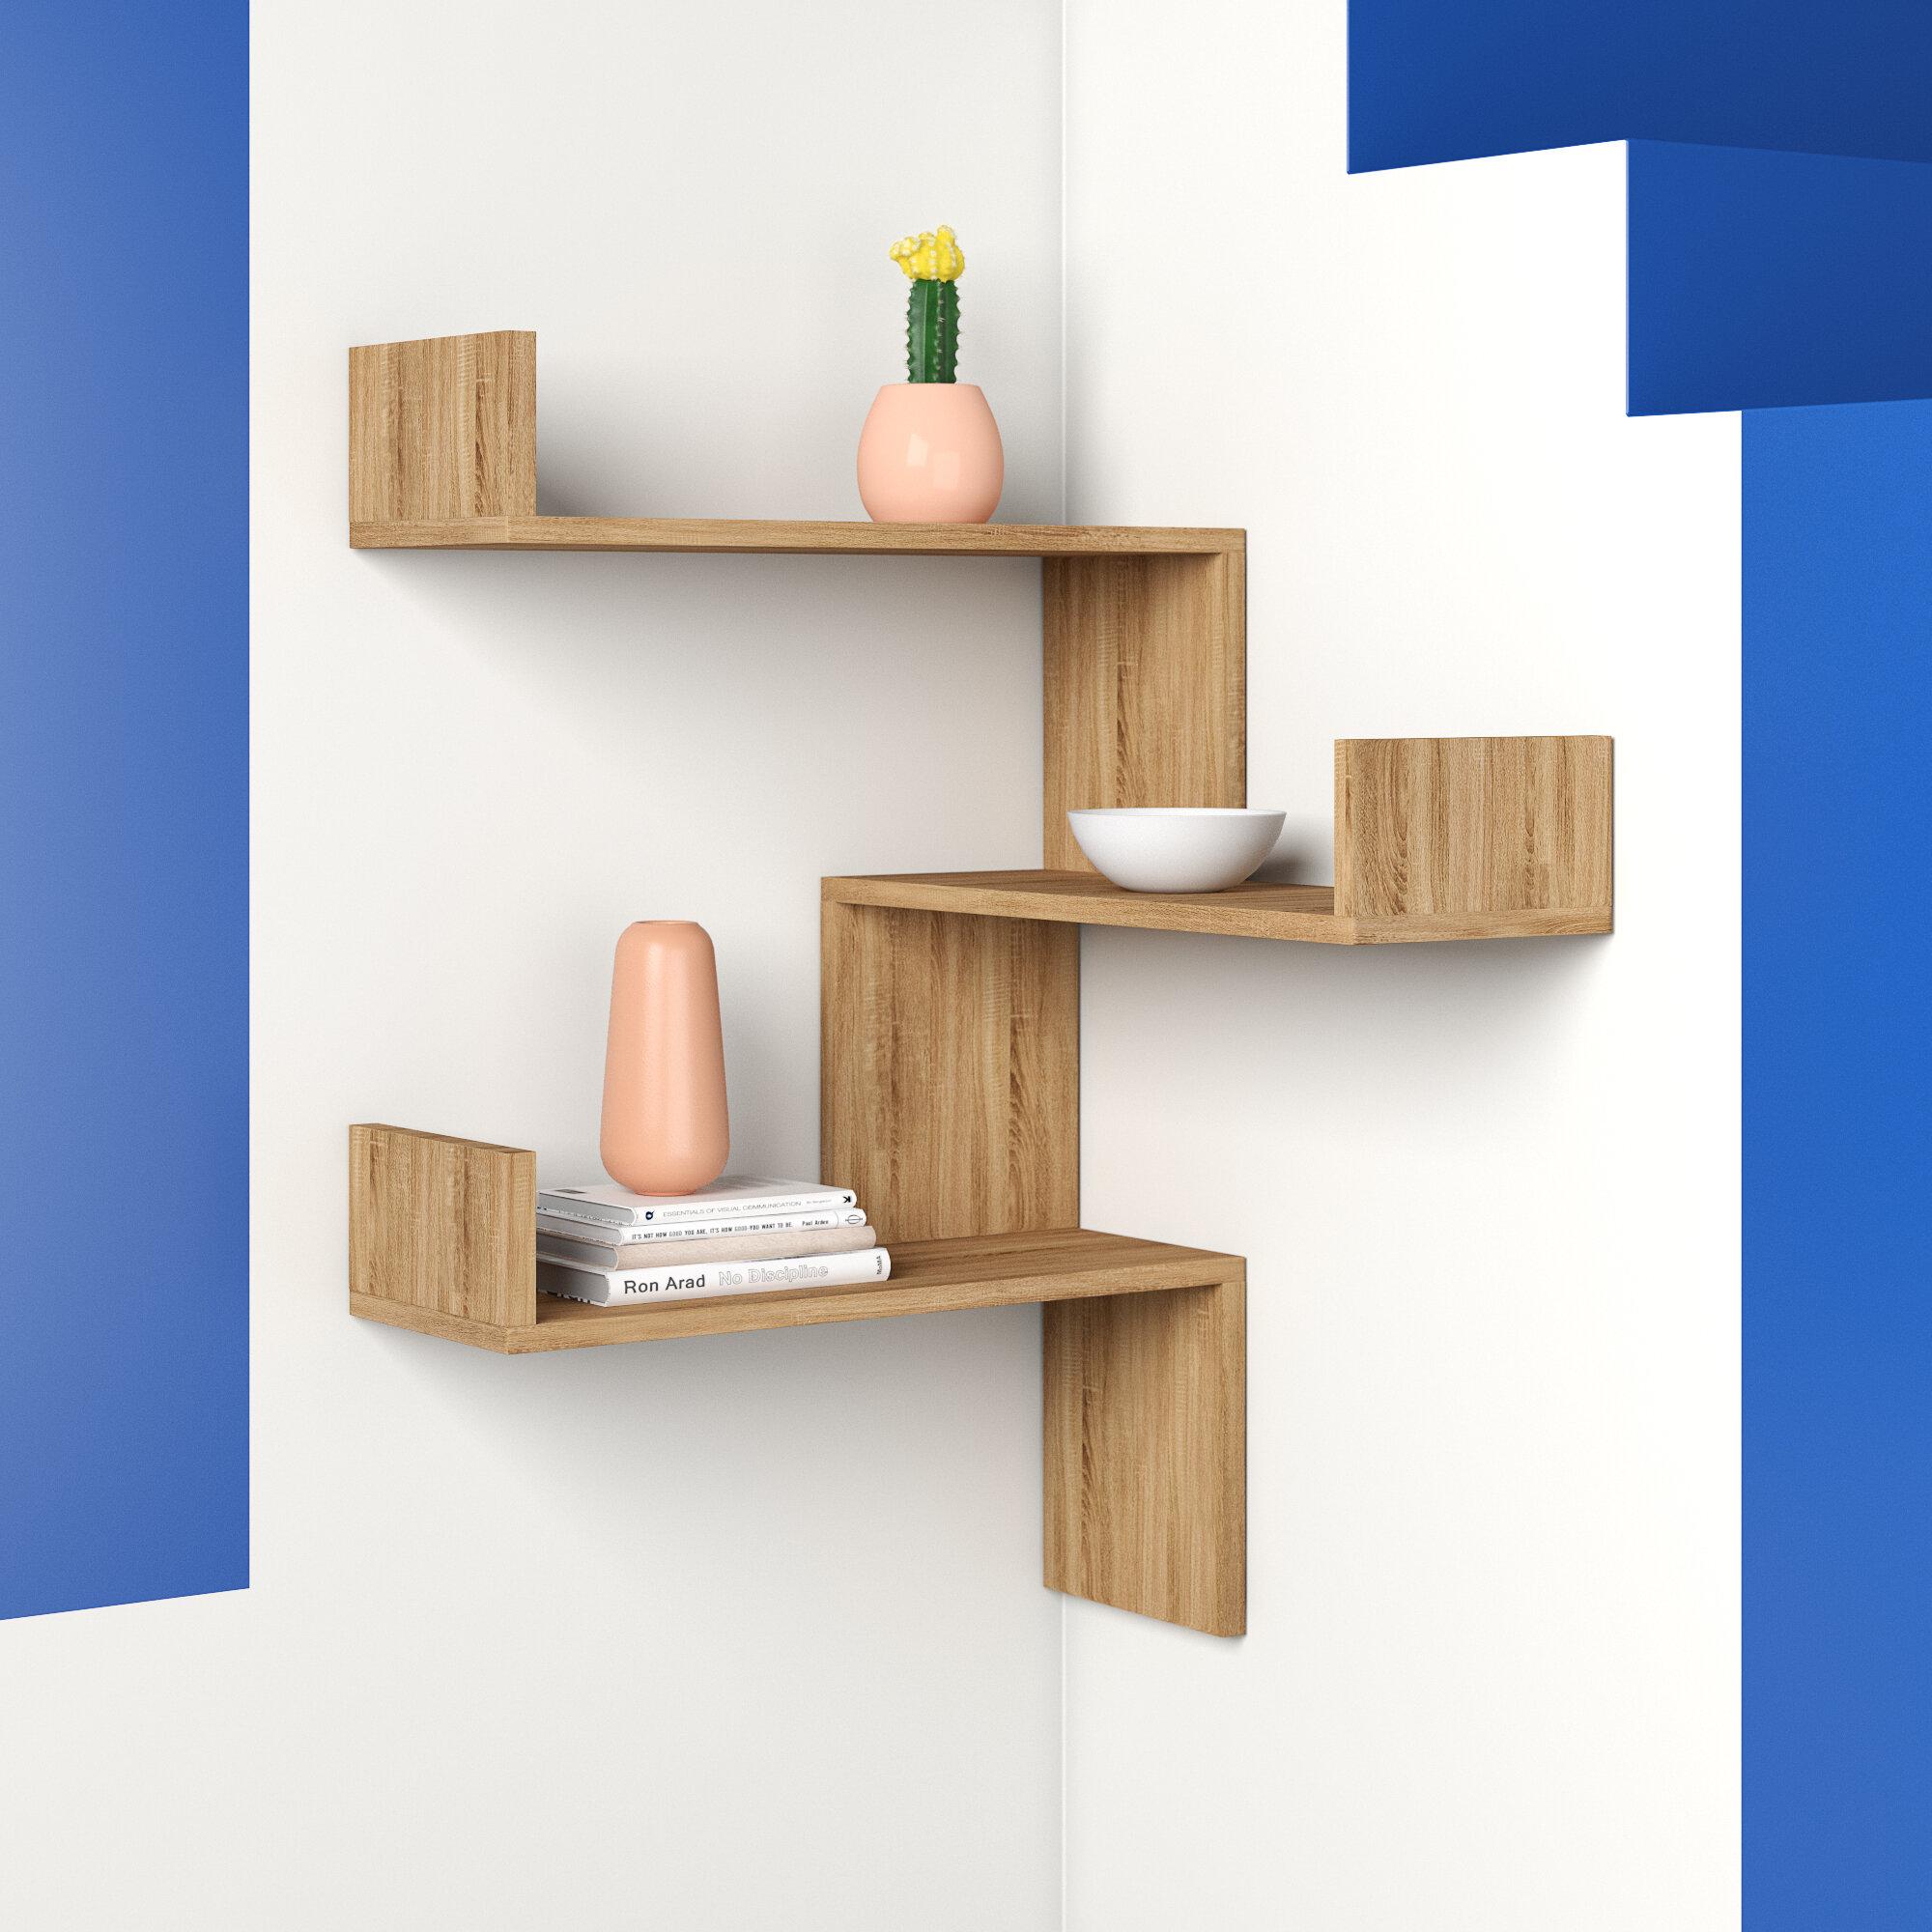 Hashtag Home Luci Floating Shelf Reviews Wayfair Co Uk